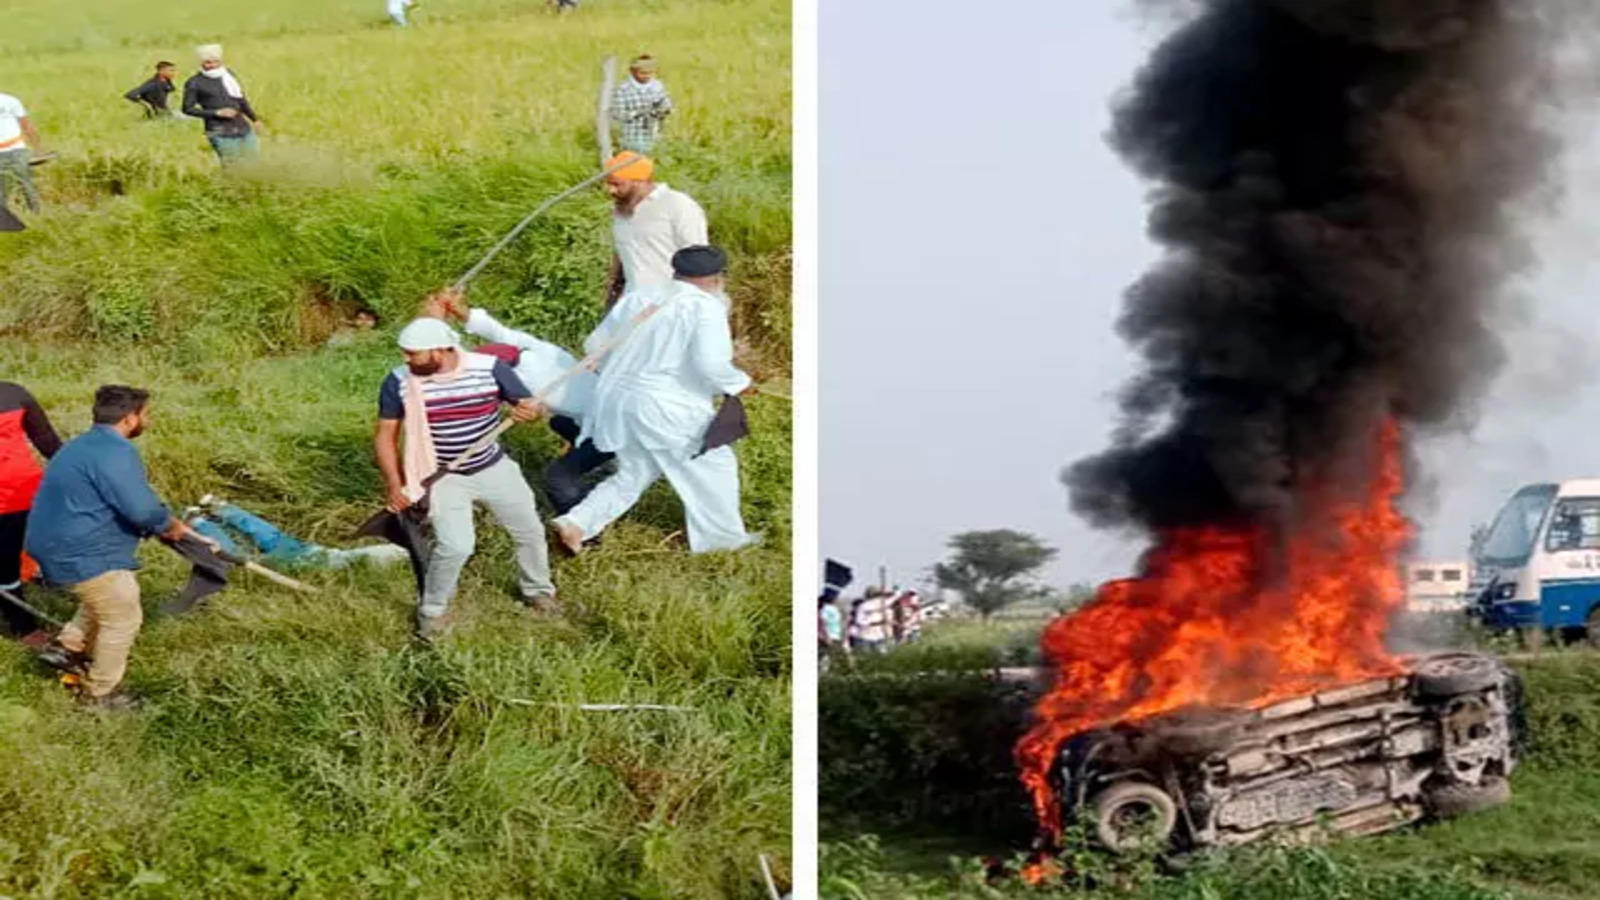 Lakhimpur Kheri violence: SC says not satisfied with UP govt action